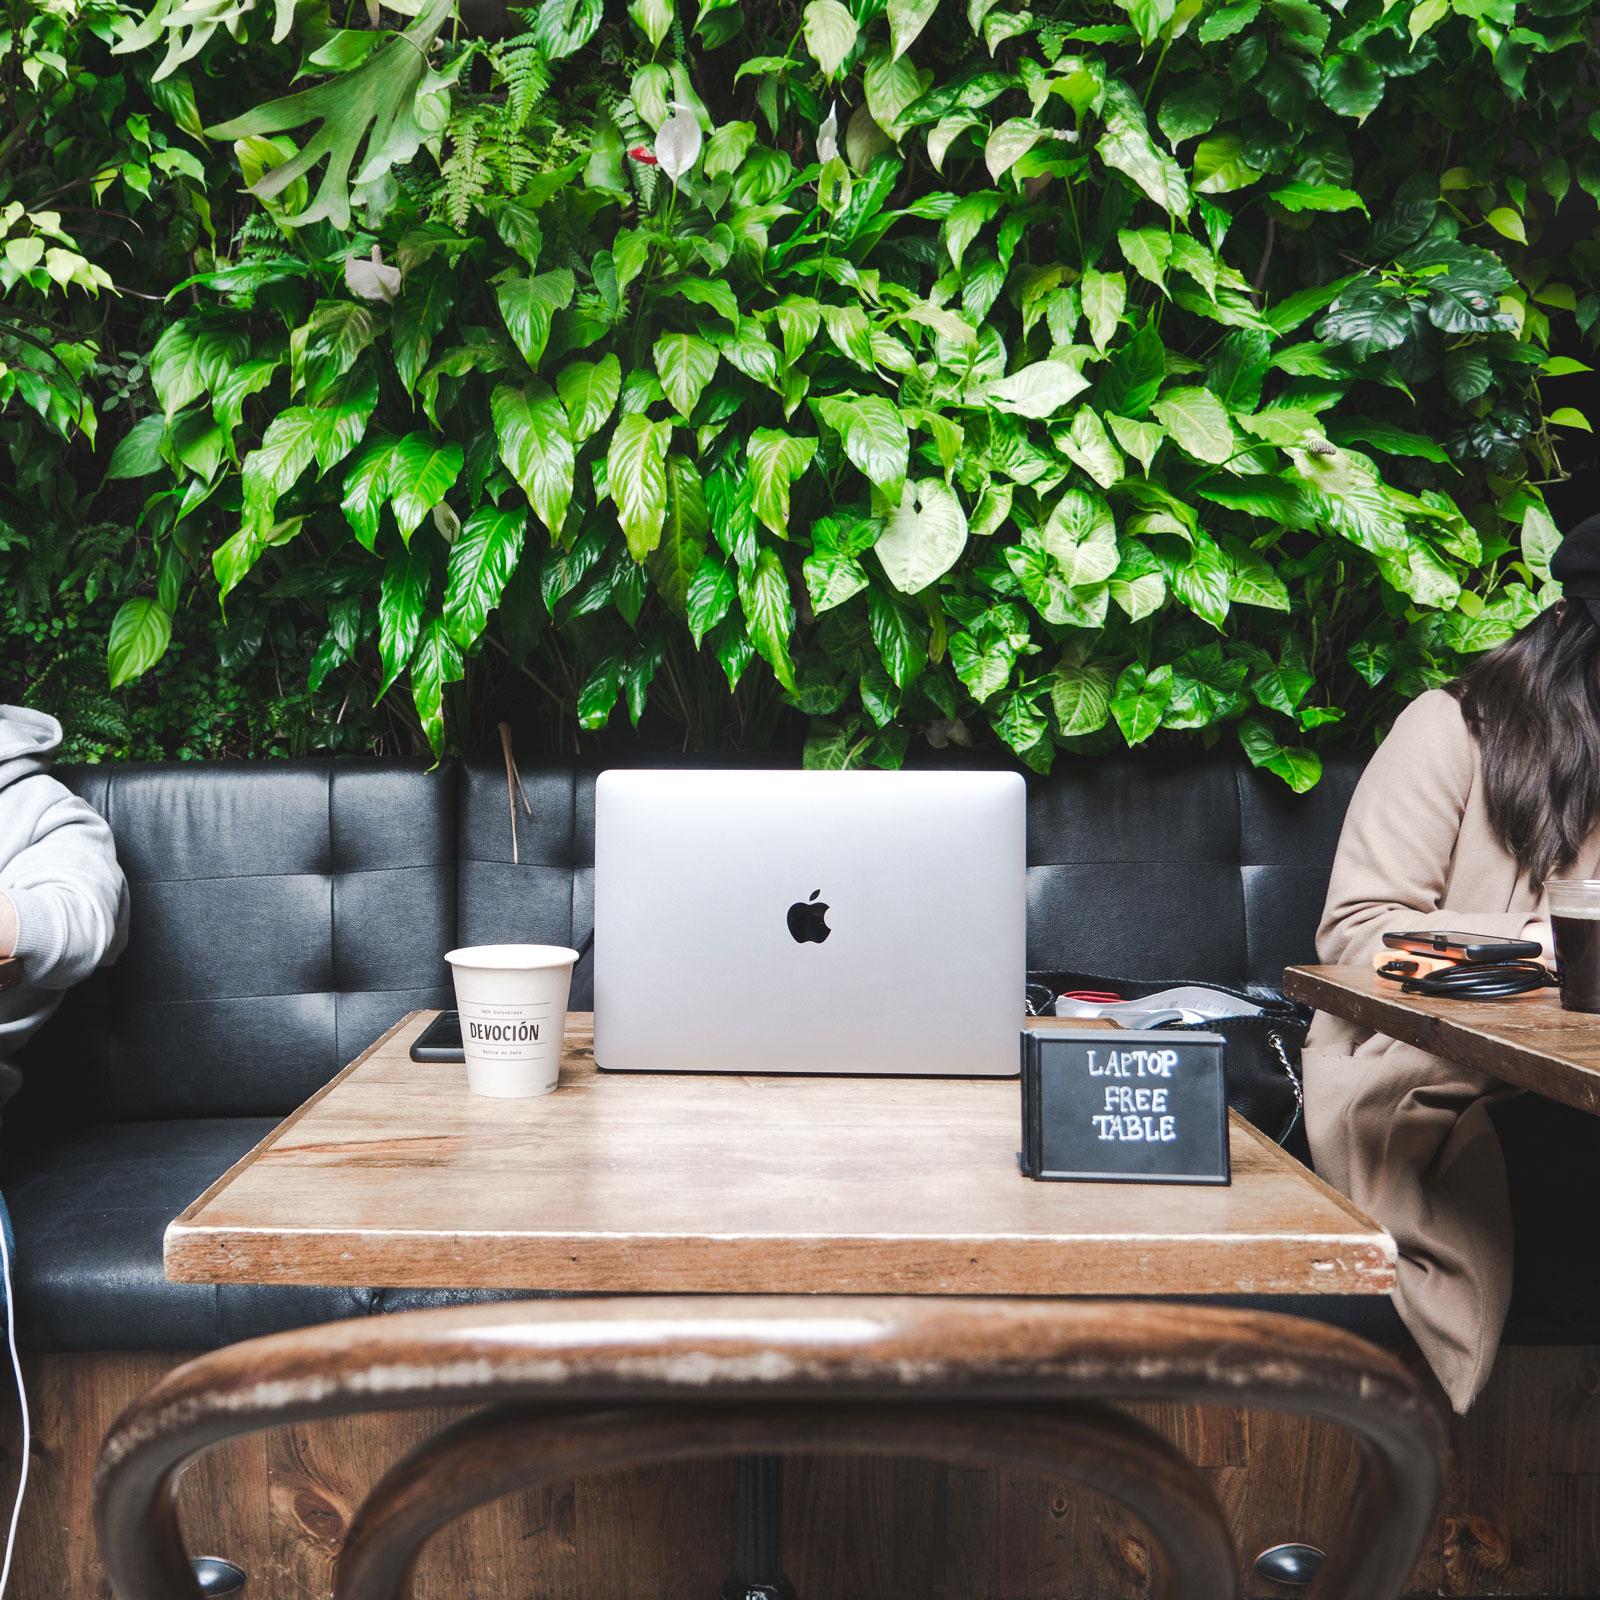 New Work Arbeitsumgebung.green  - Arbeit 4.0 (Teil 1)